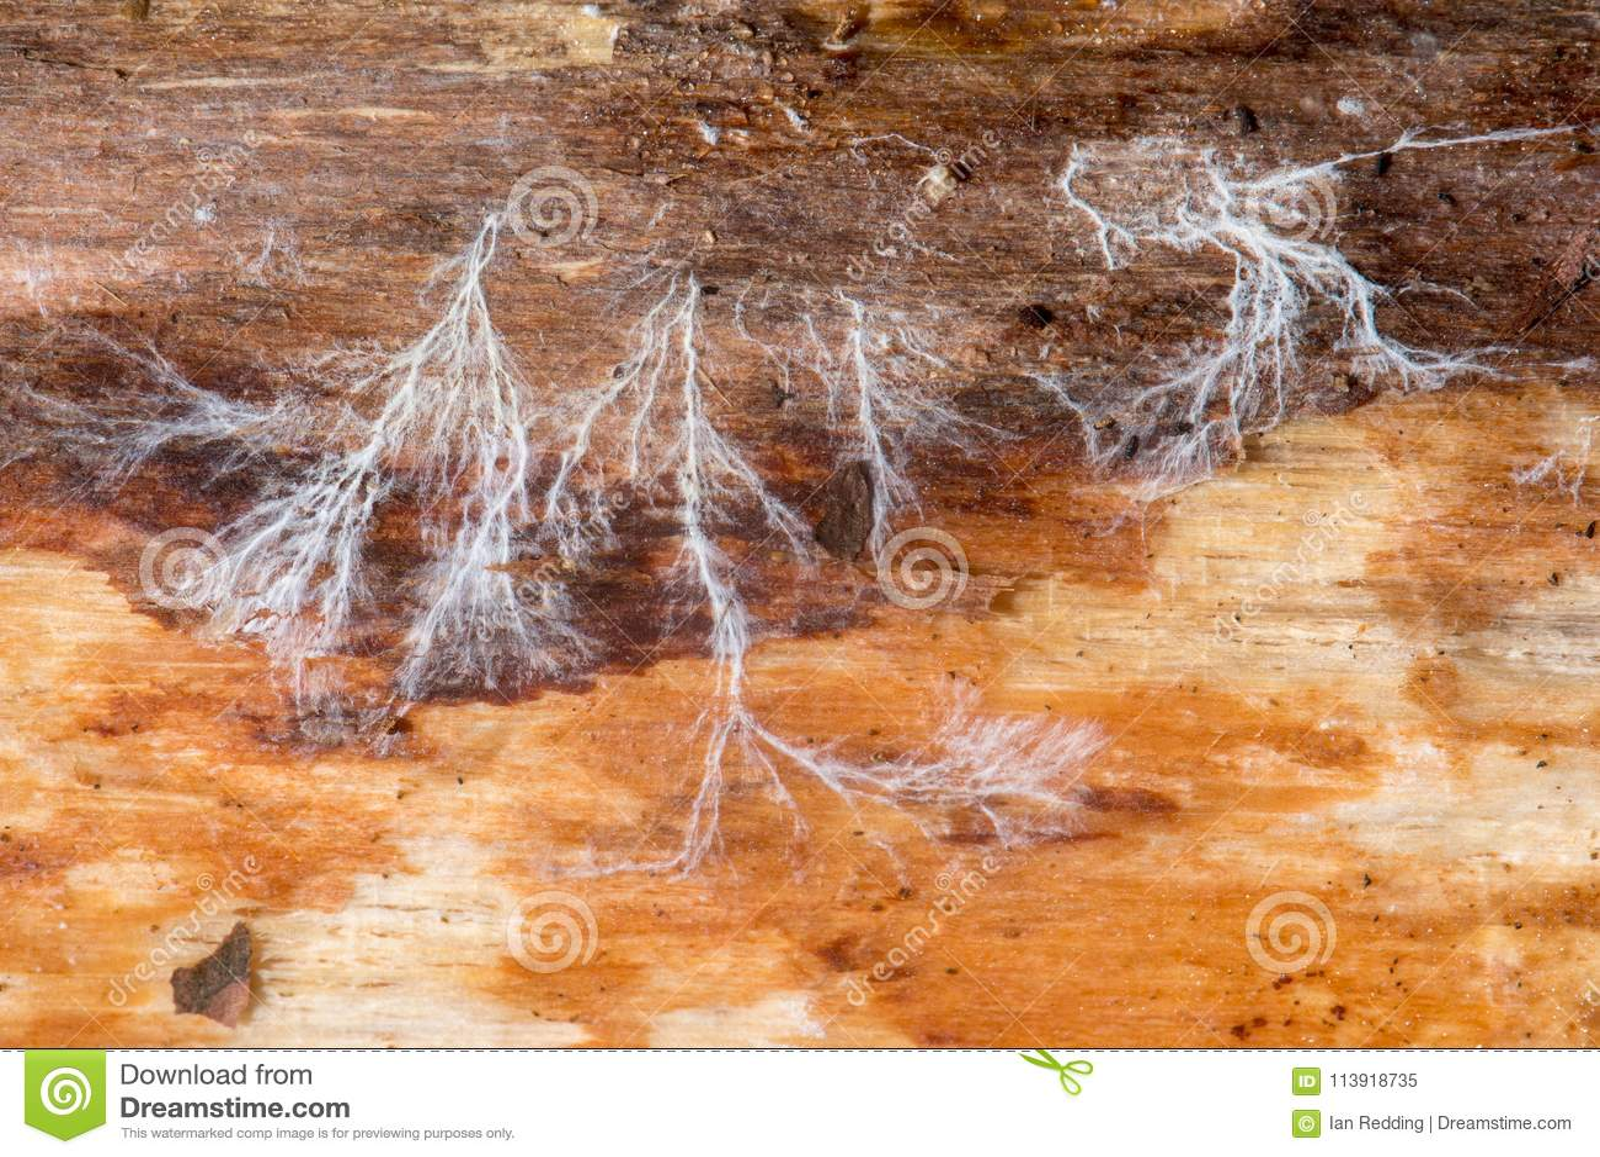 Pilzartiges Myzel auf totem Holz